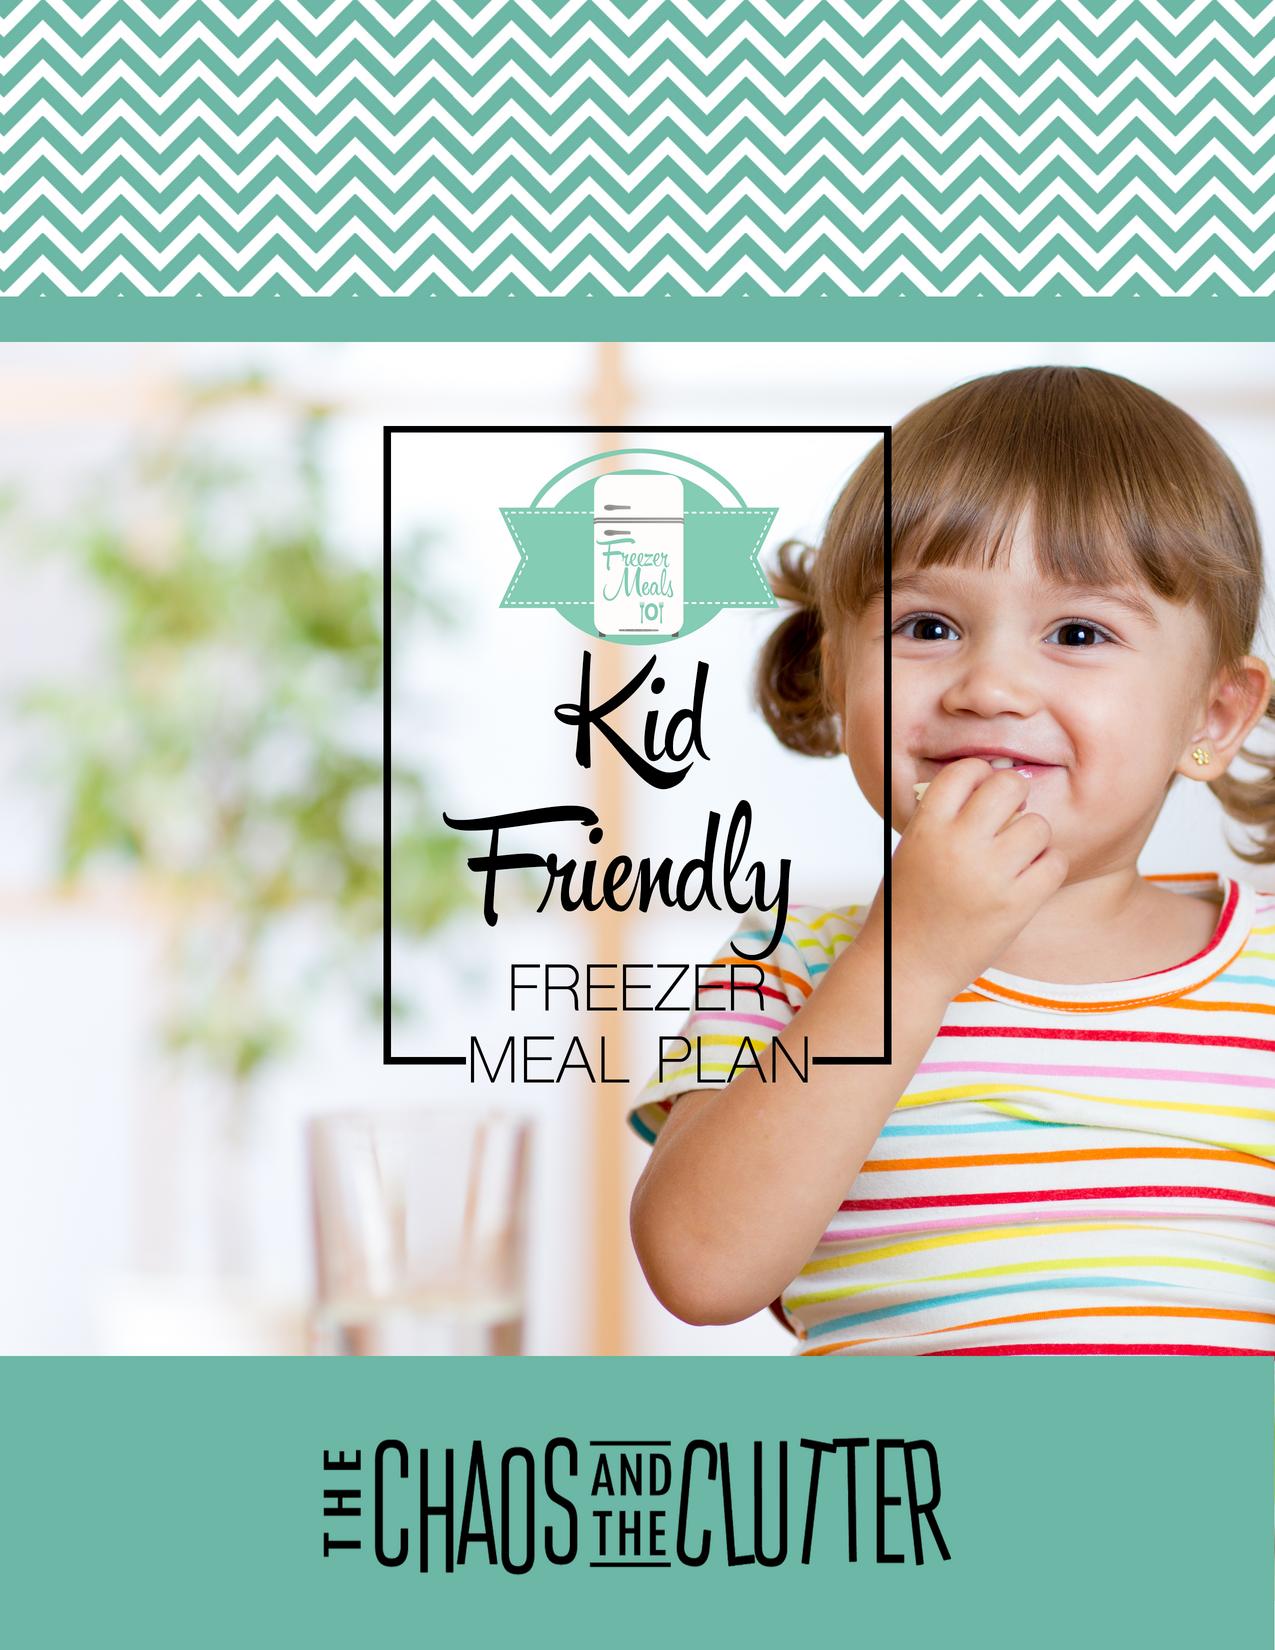 kidfriendlycover